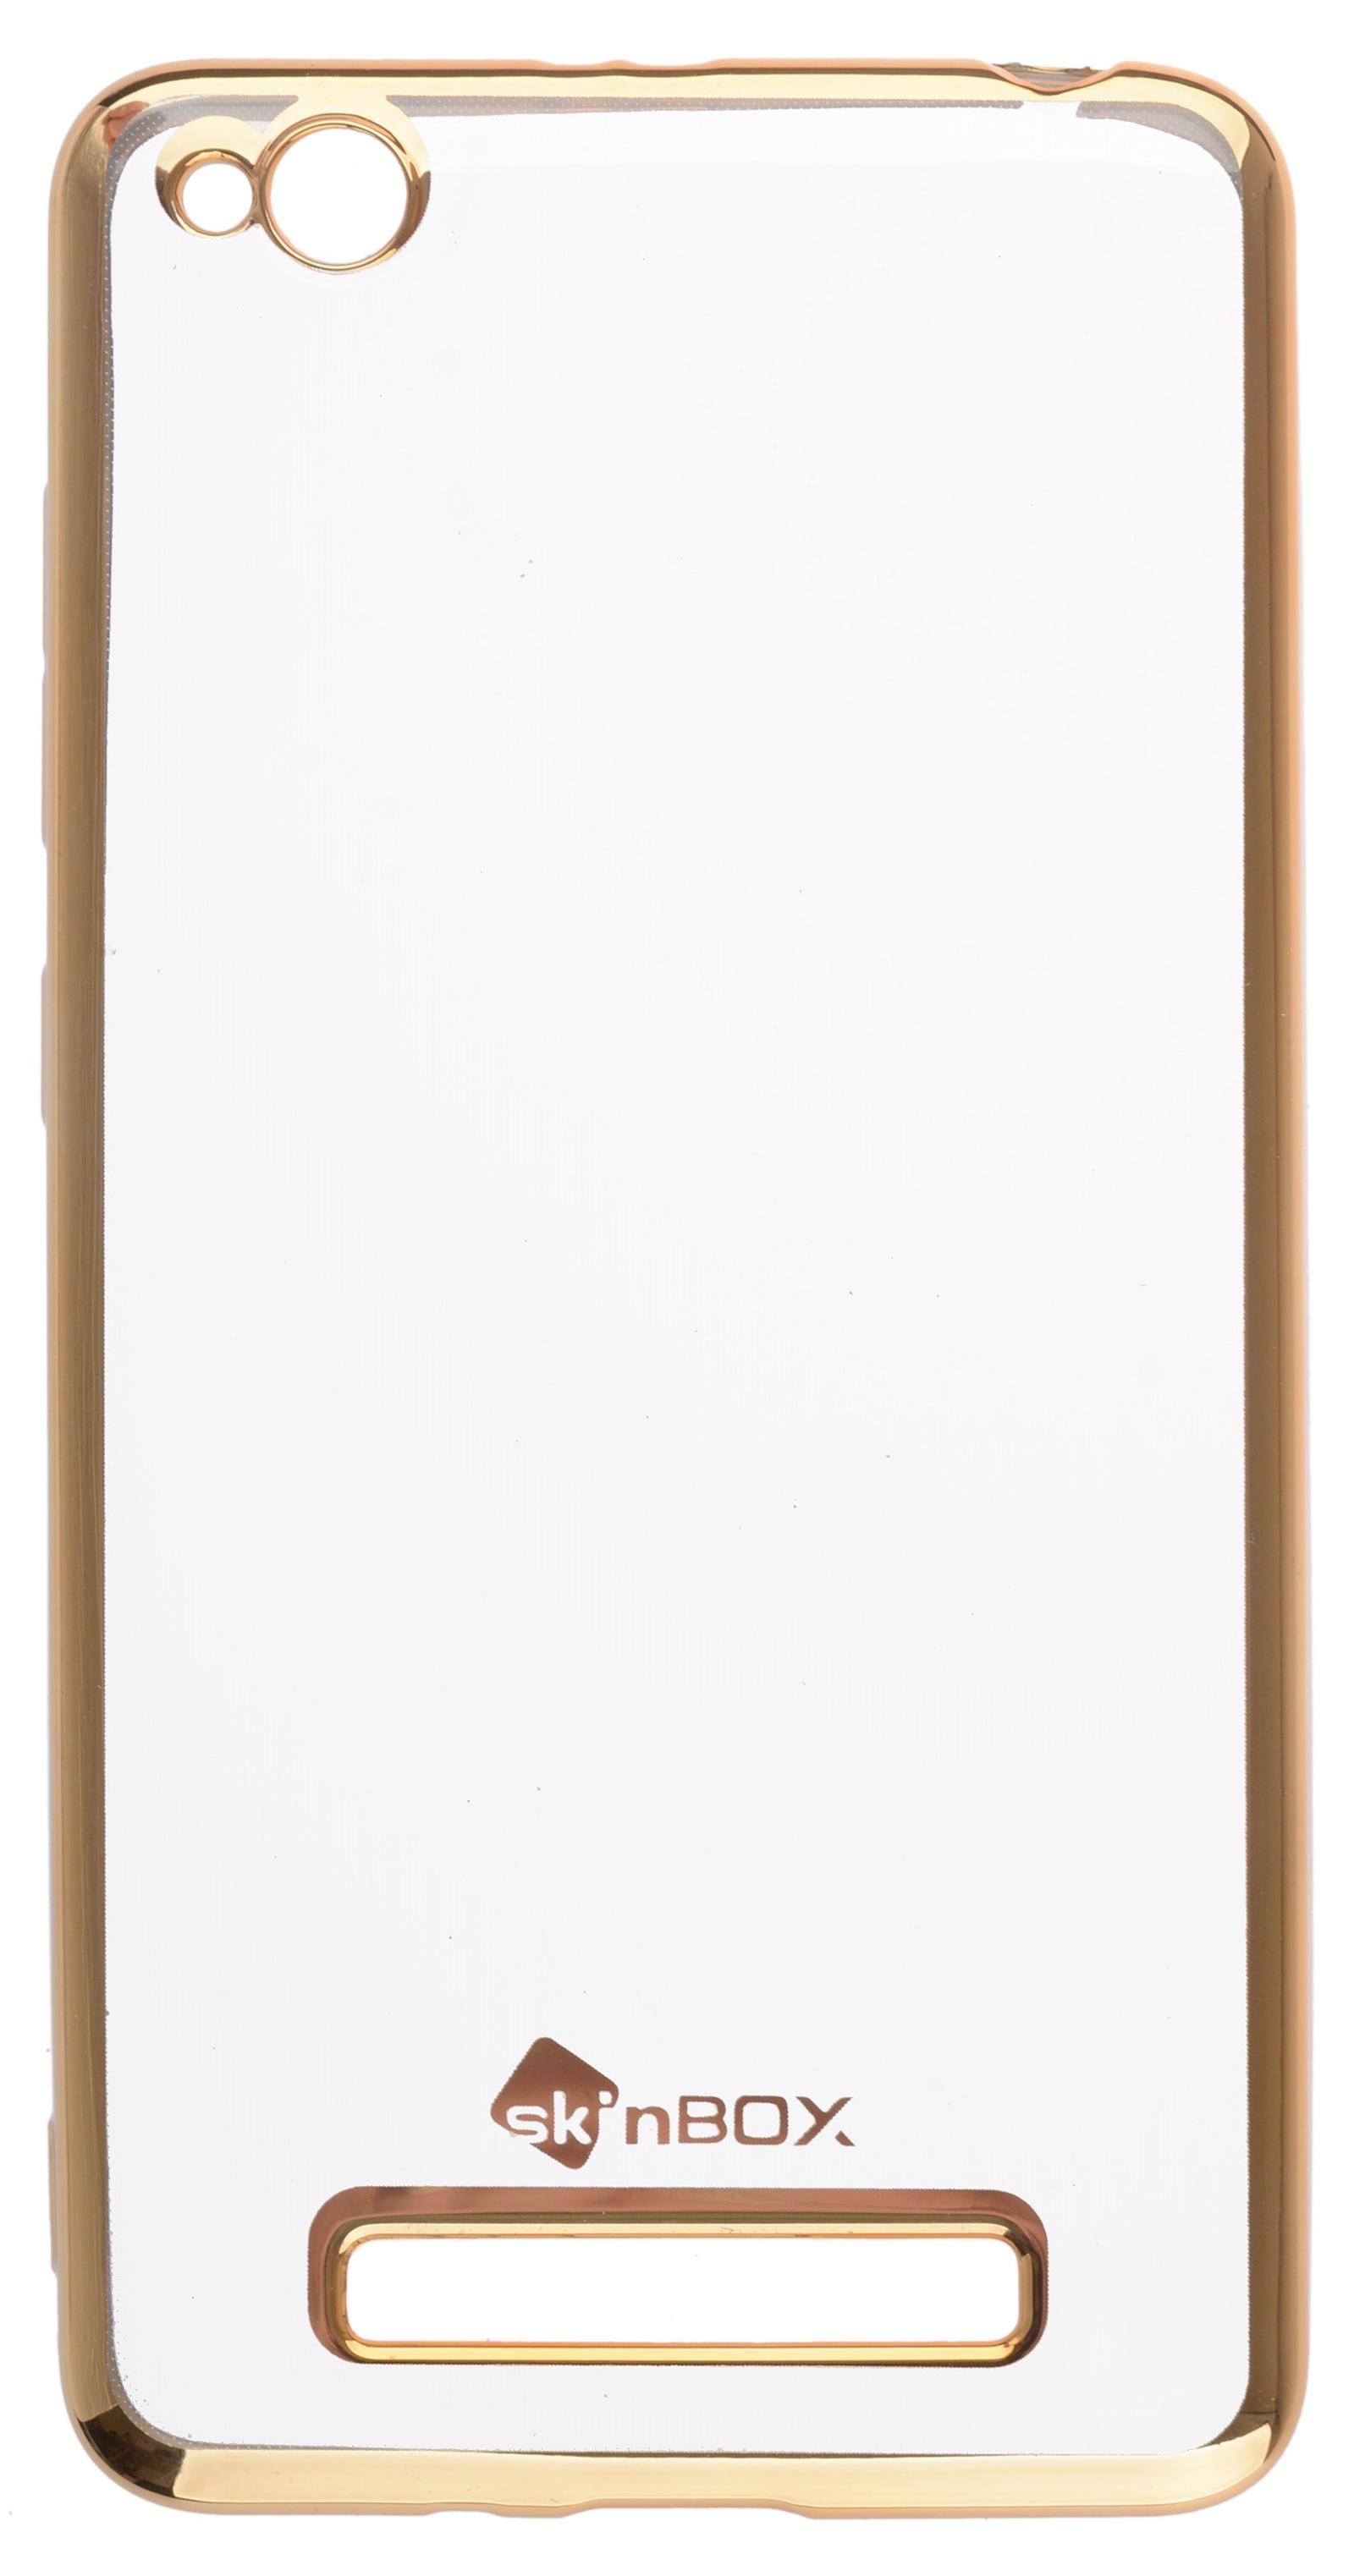 Чехол для сотового телефона skinBOX Silicone chrome border, 4660041408355, золотой skinbox silicone chrome border 4people чехол для xiaomi redmi 4 silver